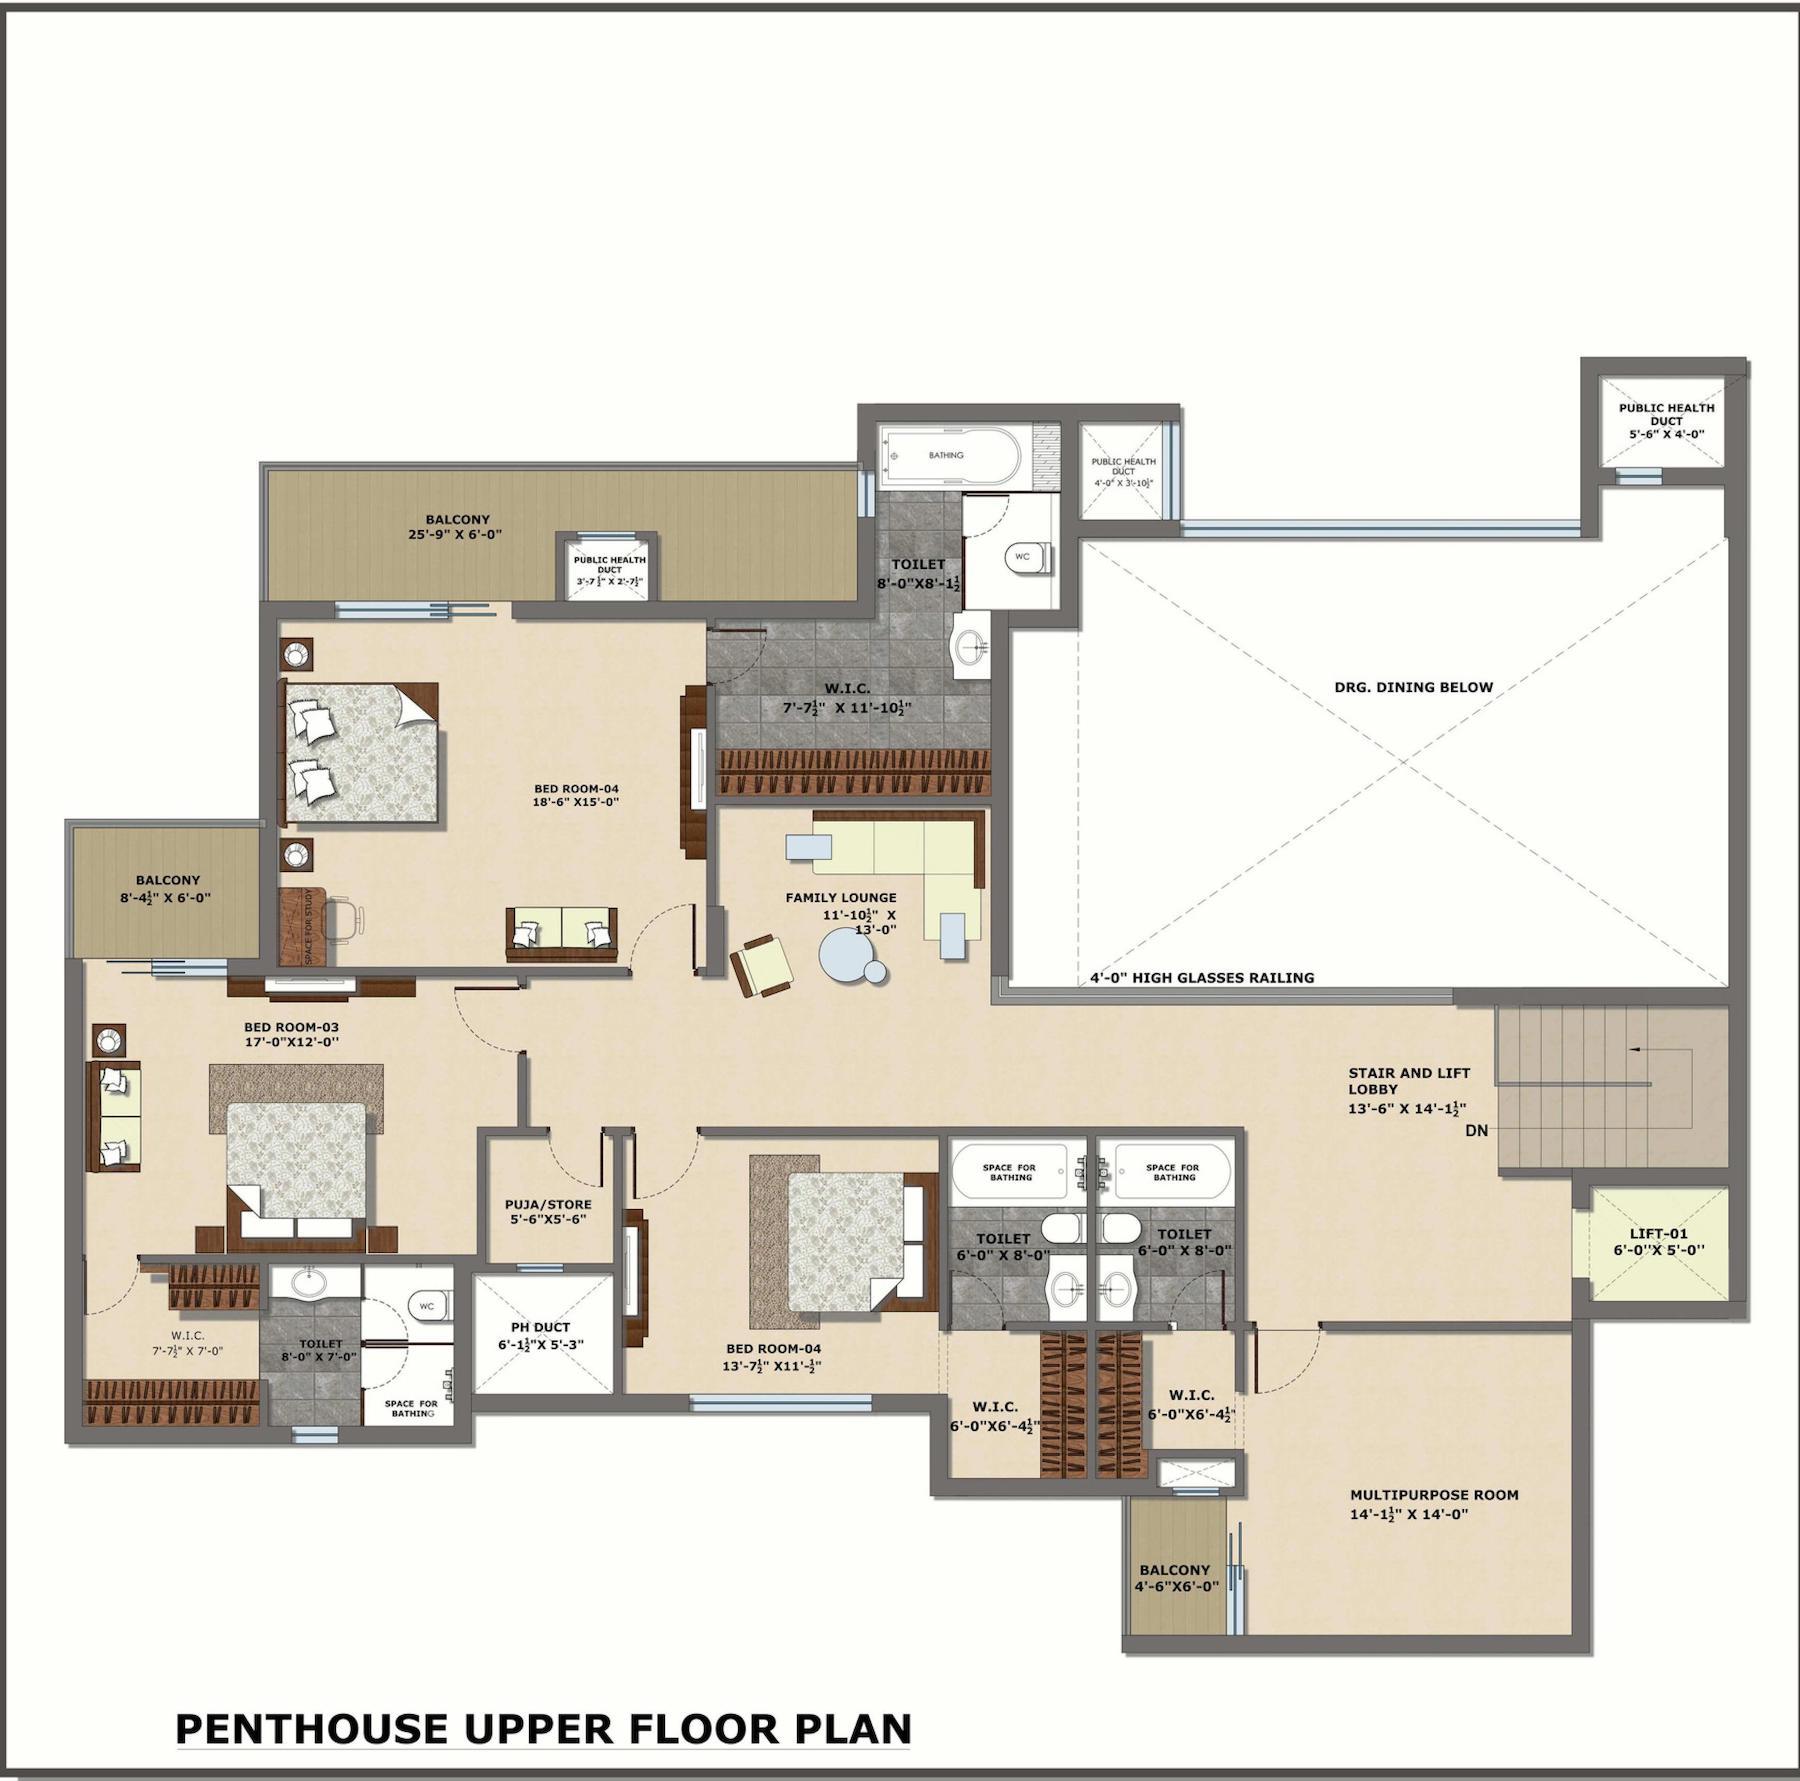 Penthouse, UpperFloor